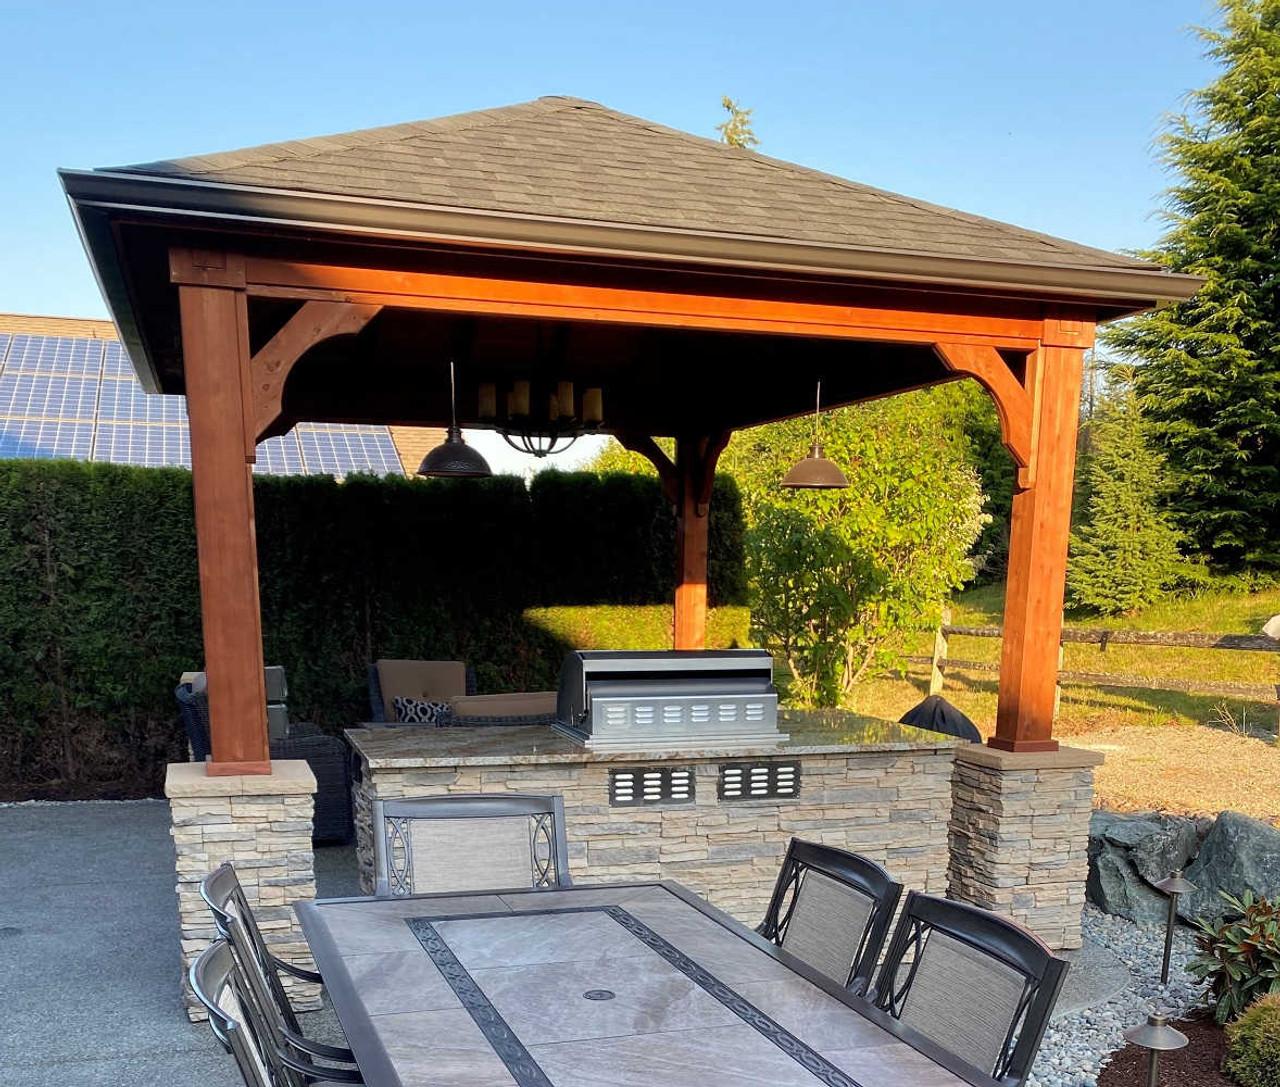 Hip Roof Cedar Pavilion with Rustic Black Shingles and Rustic Cedar Stain, Redmond, WA